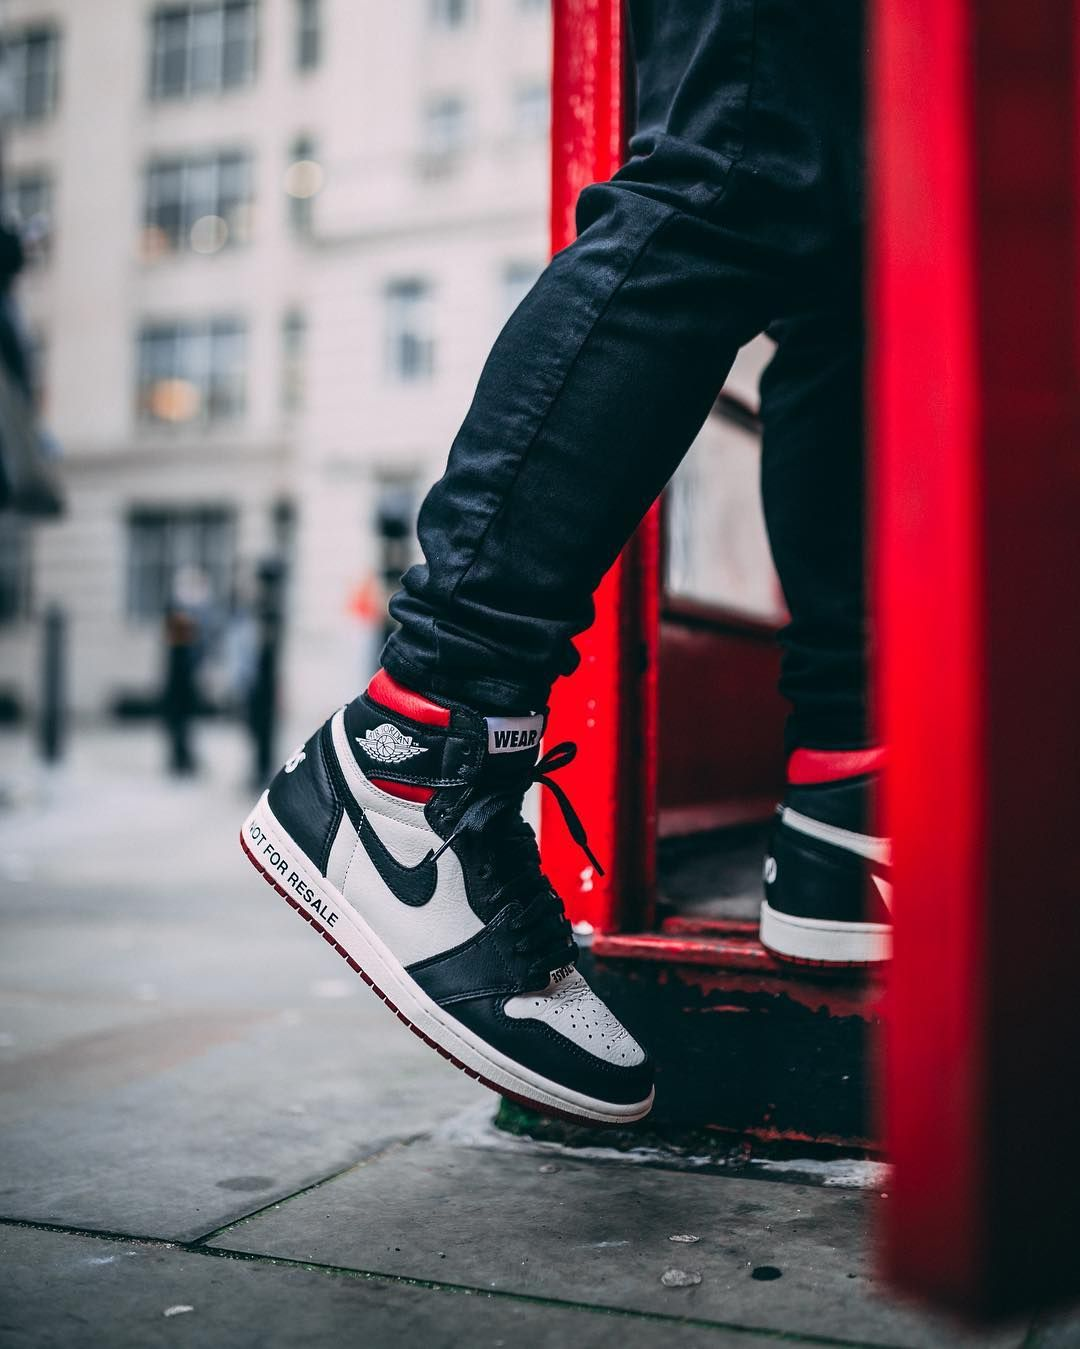 Air jordans, Nike lifestyle shoes